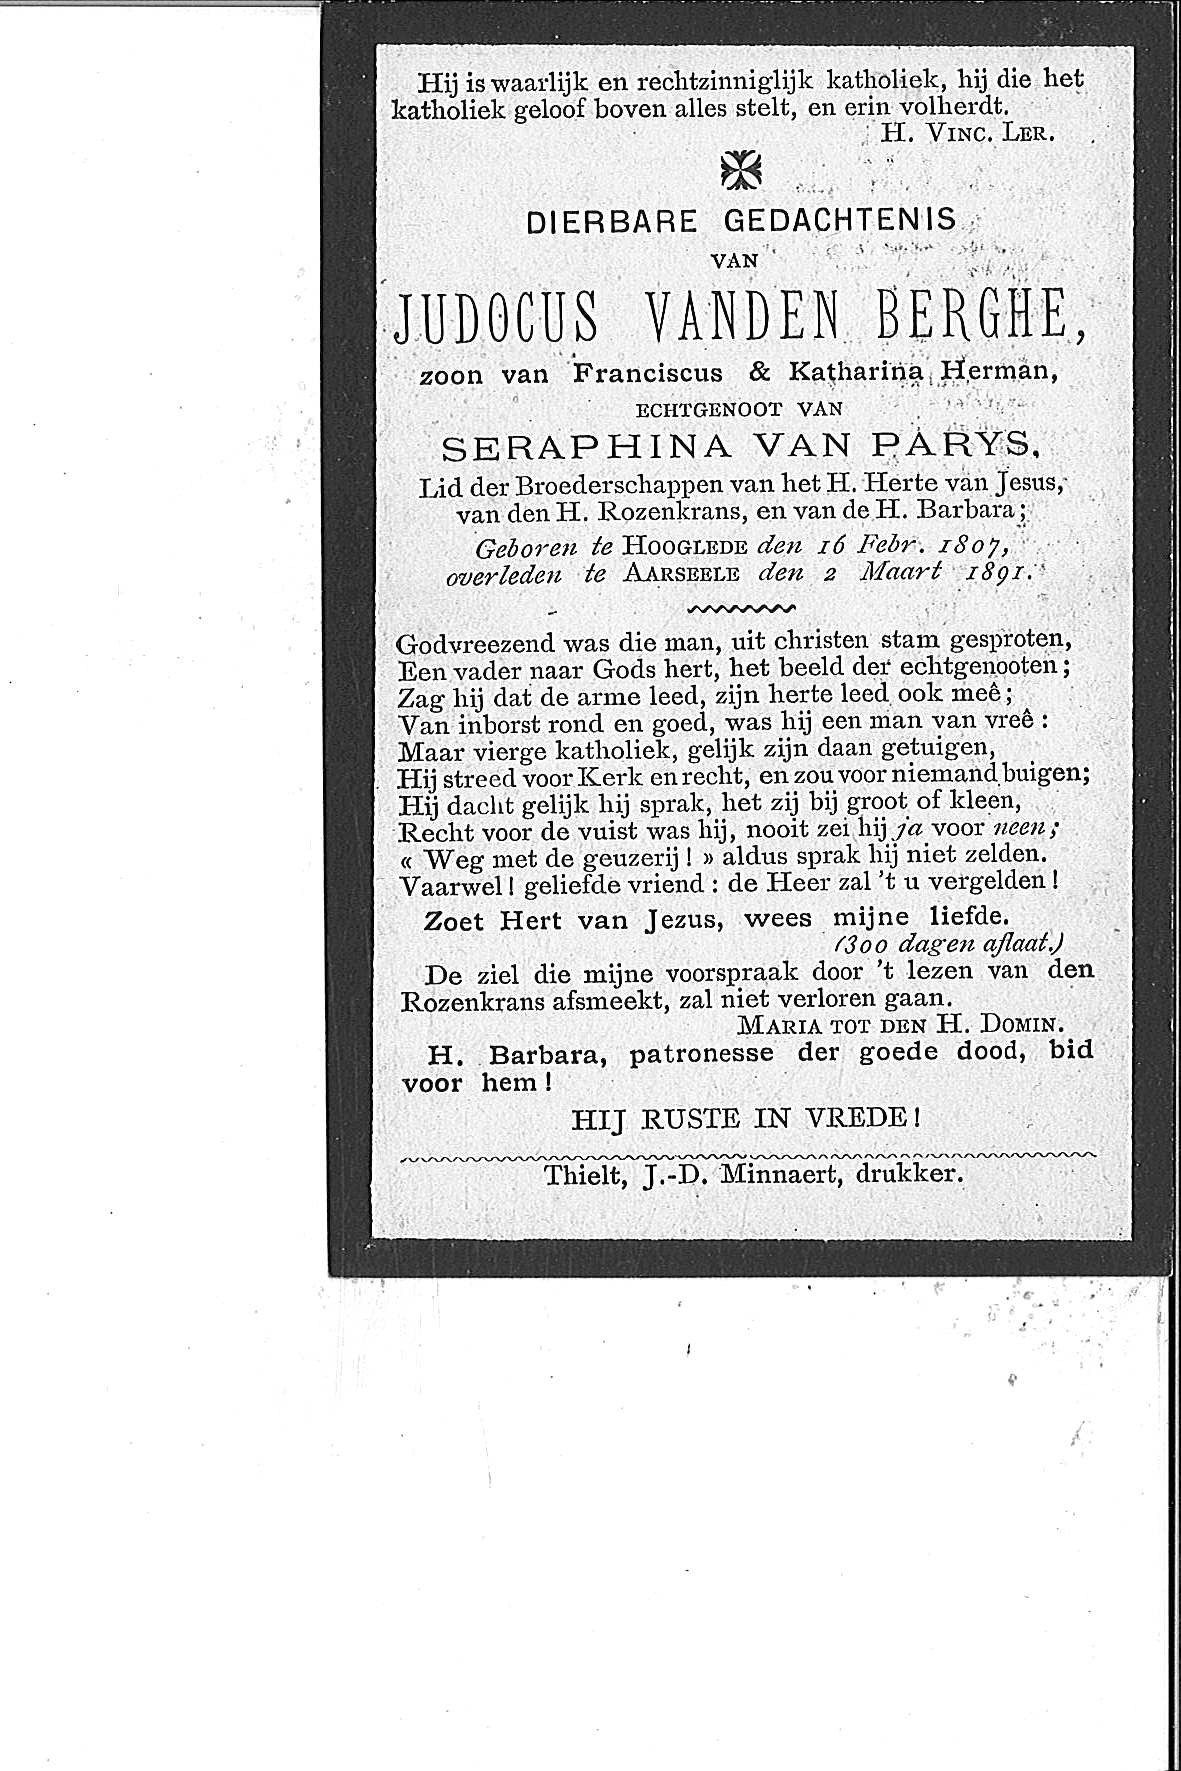 Judocus(1891)20150803143905_00041.jpg